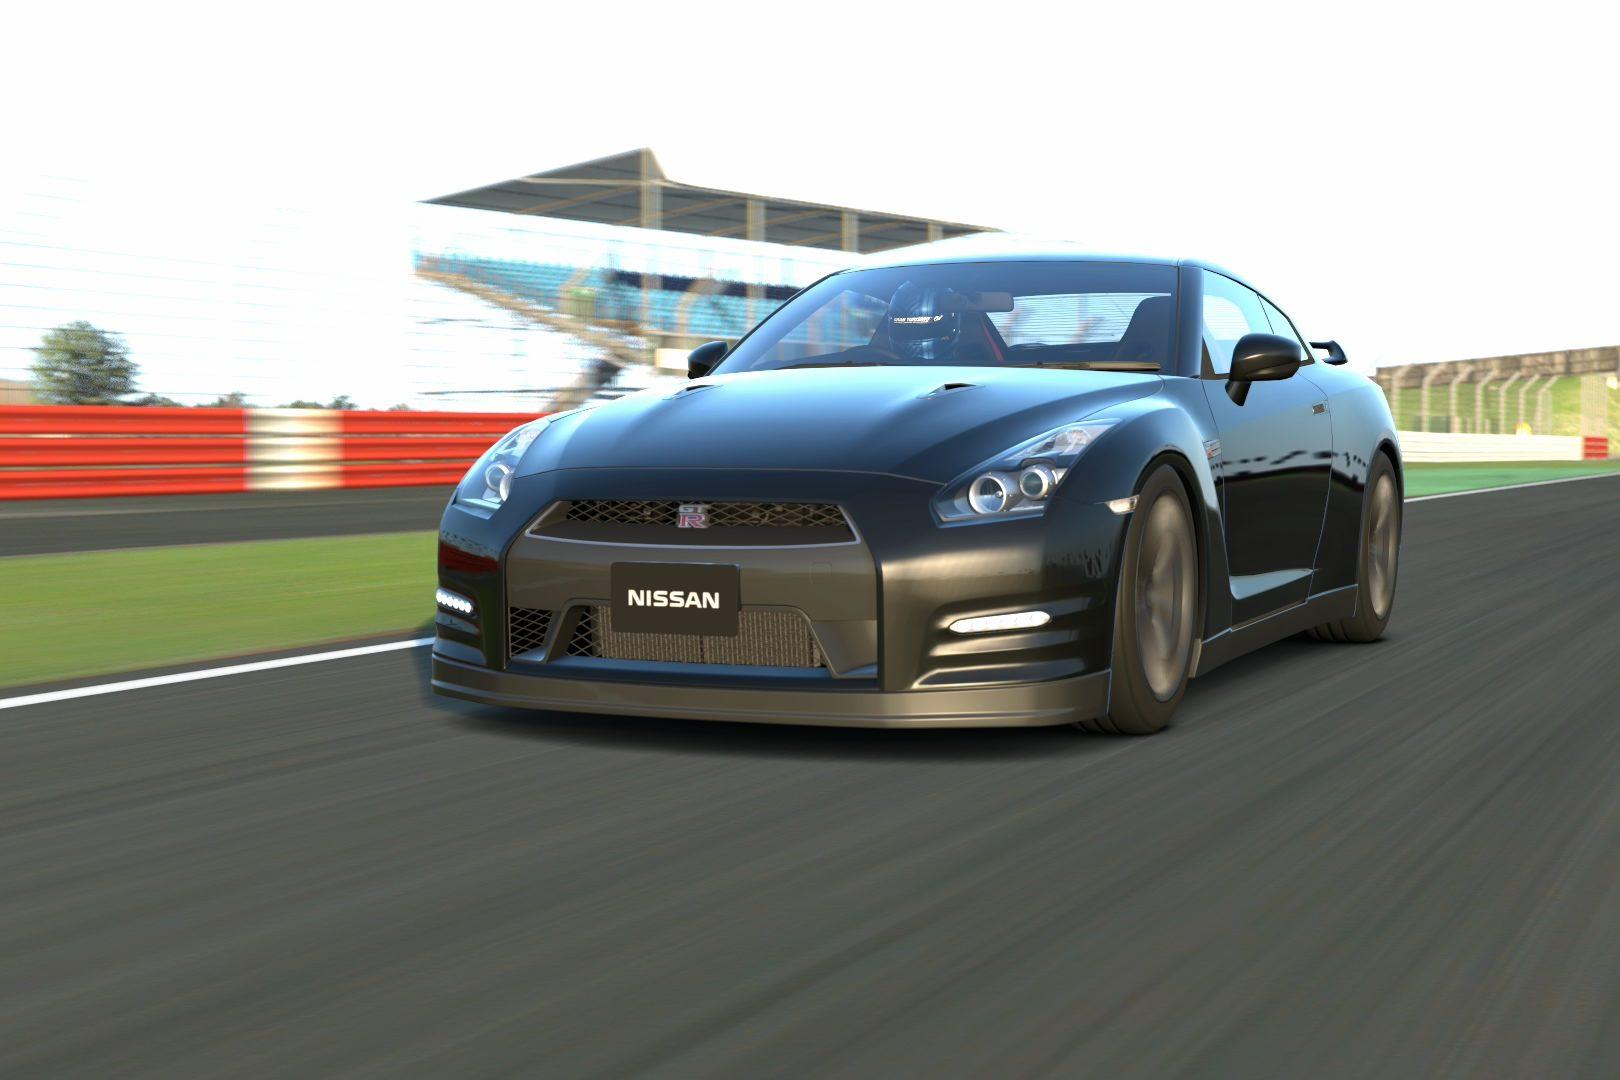 Nissan GT-R Black Edition '12 (Car).jpg